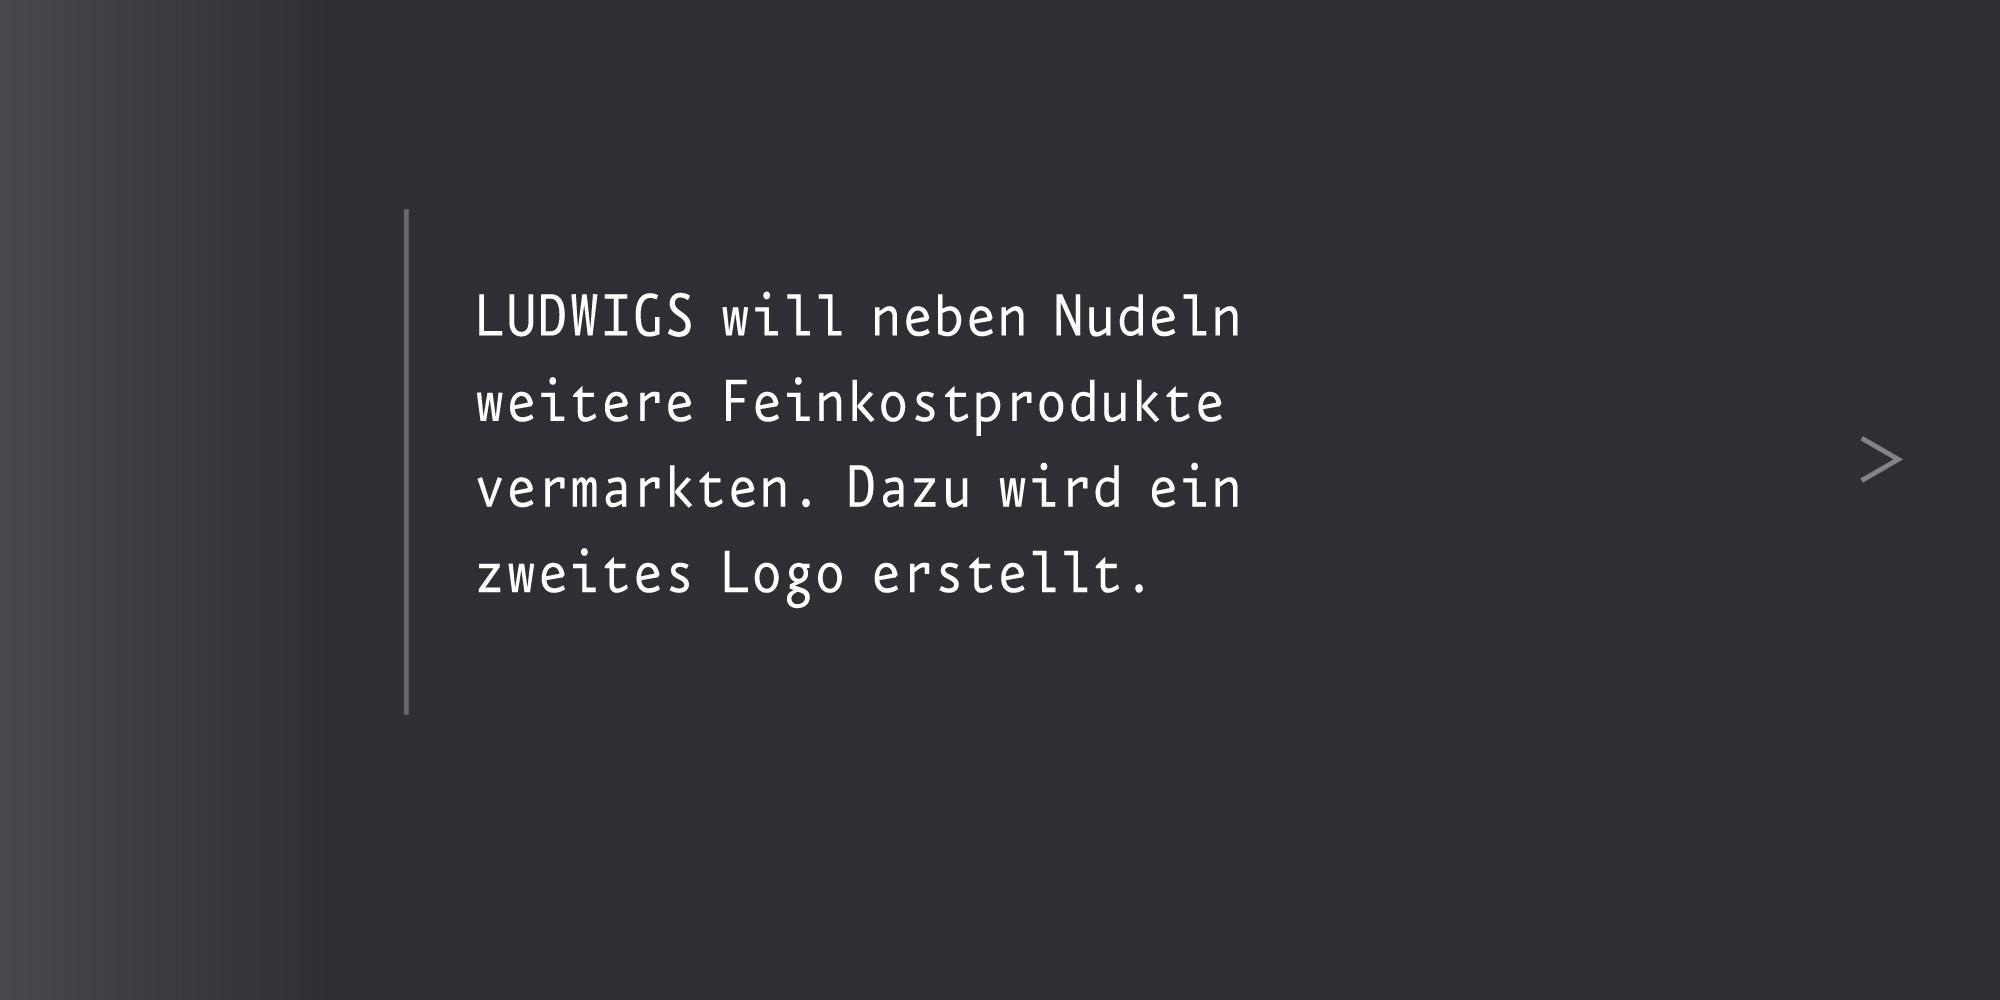 Marken-System Ludwigs neues Logo gestalten